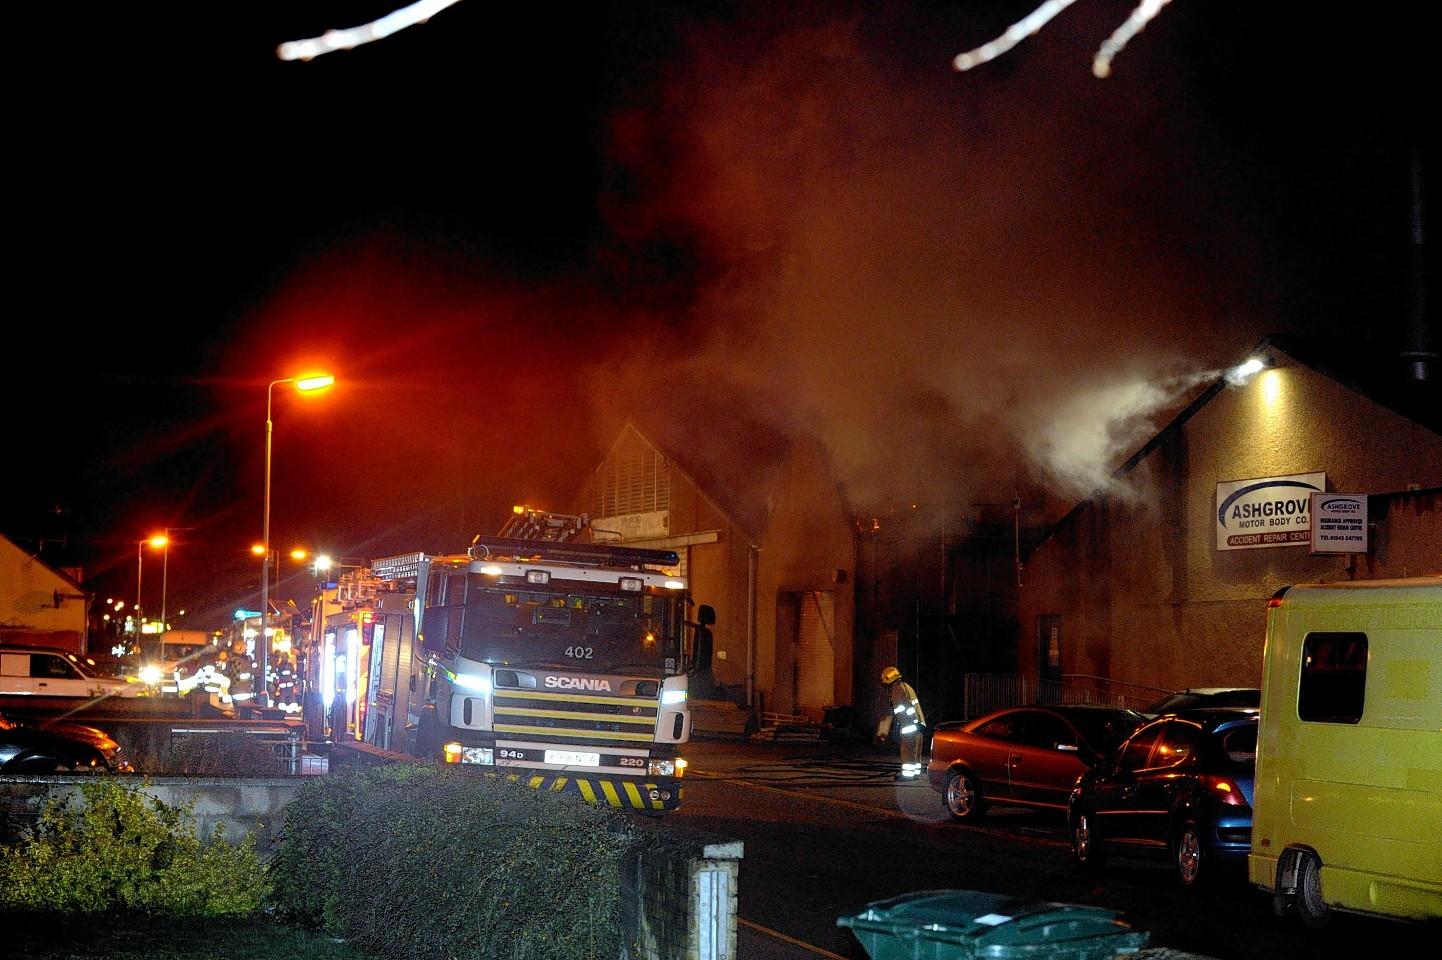 Ashgrove Road fire, Elgin